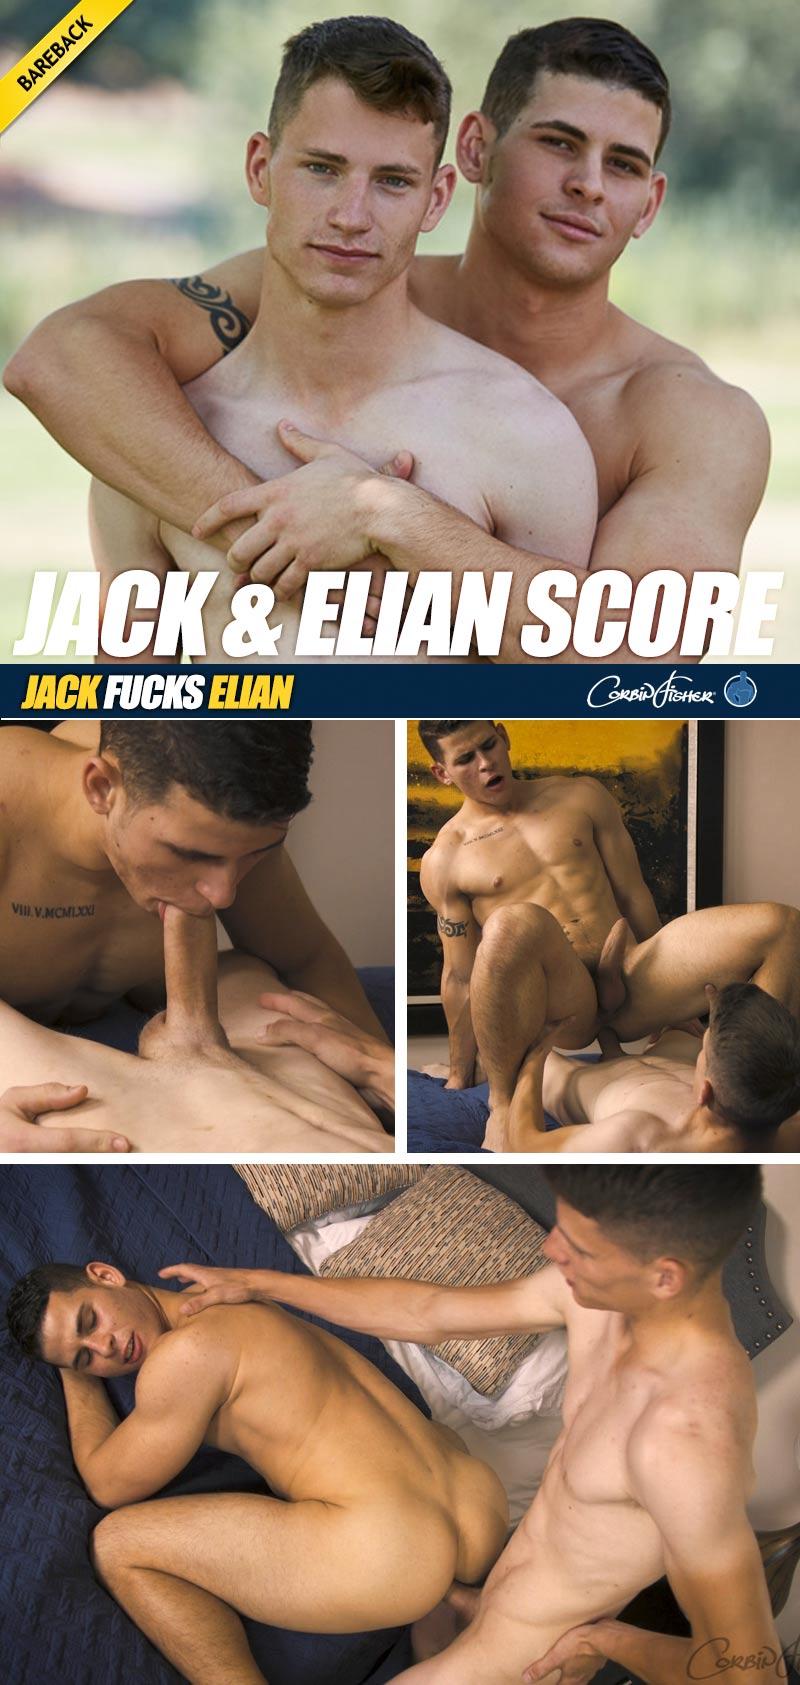 Jack & Elian Score (Bareback) at CorbinFisher